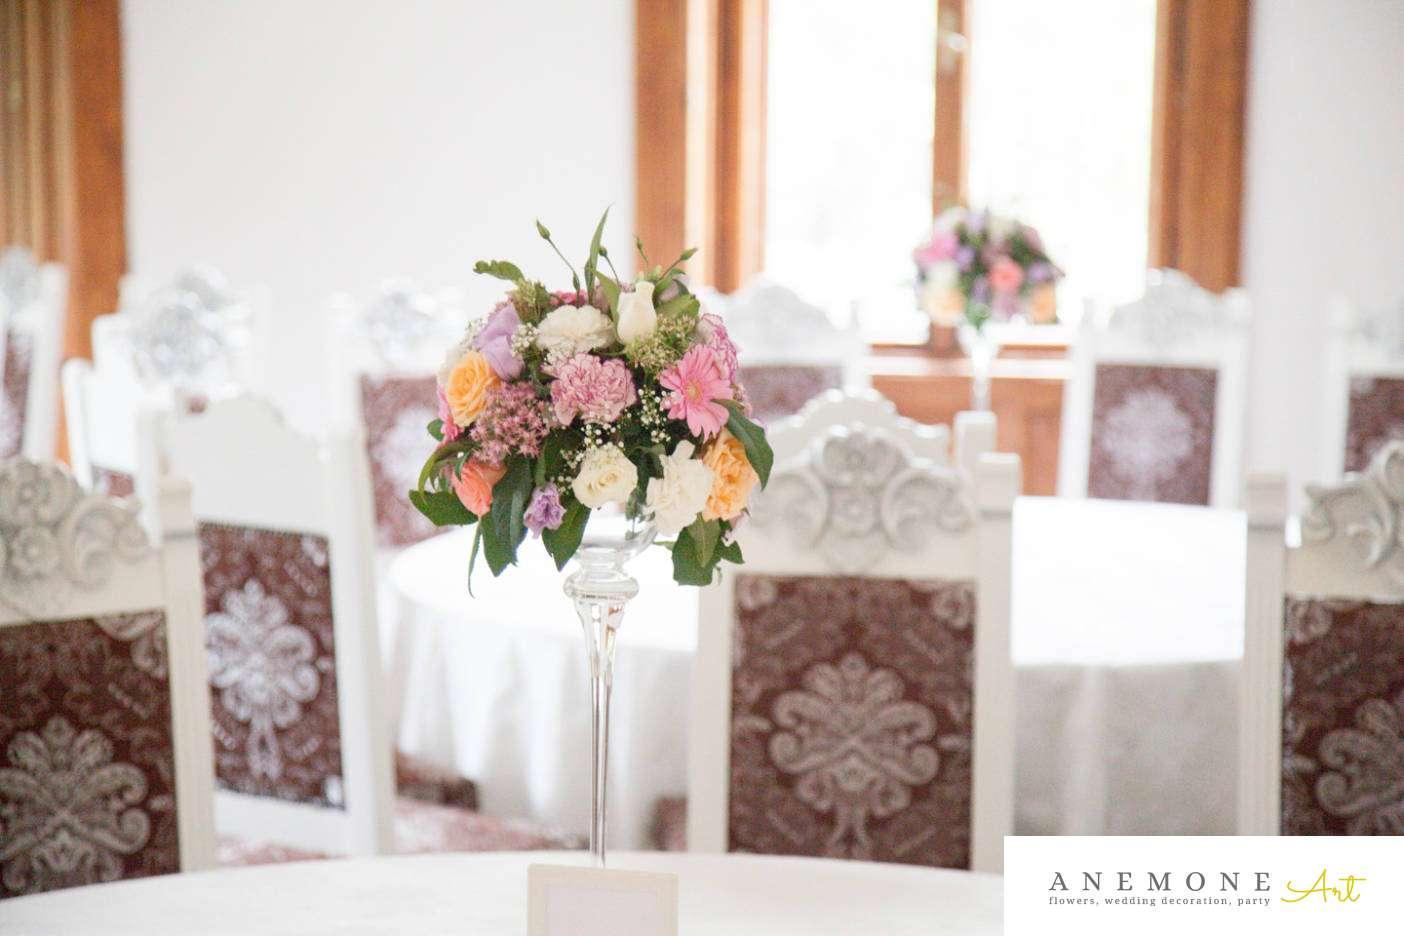 Poza, foto cu Flori de nunta alb, castel domeniul lupas, decor masa, pastel, piersica, roz in Arad, Timisoara, Oradea (wedding flowers, bouquets) nunta Arad, Timisoara, Oradea